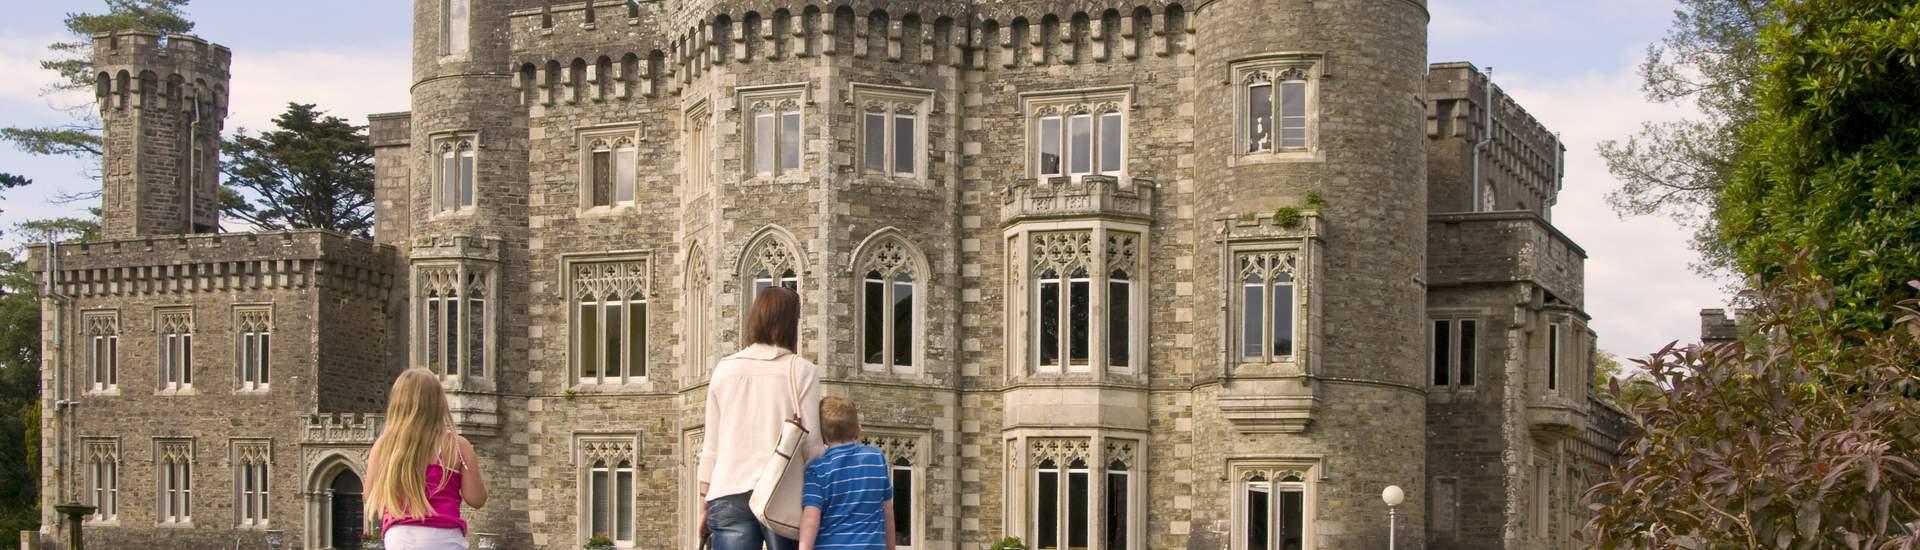 Programa de inglés para familias Wexford, Irland